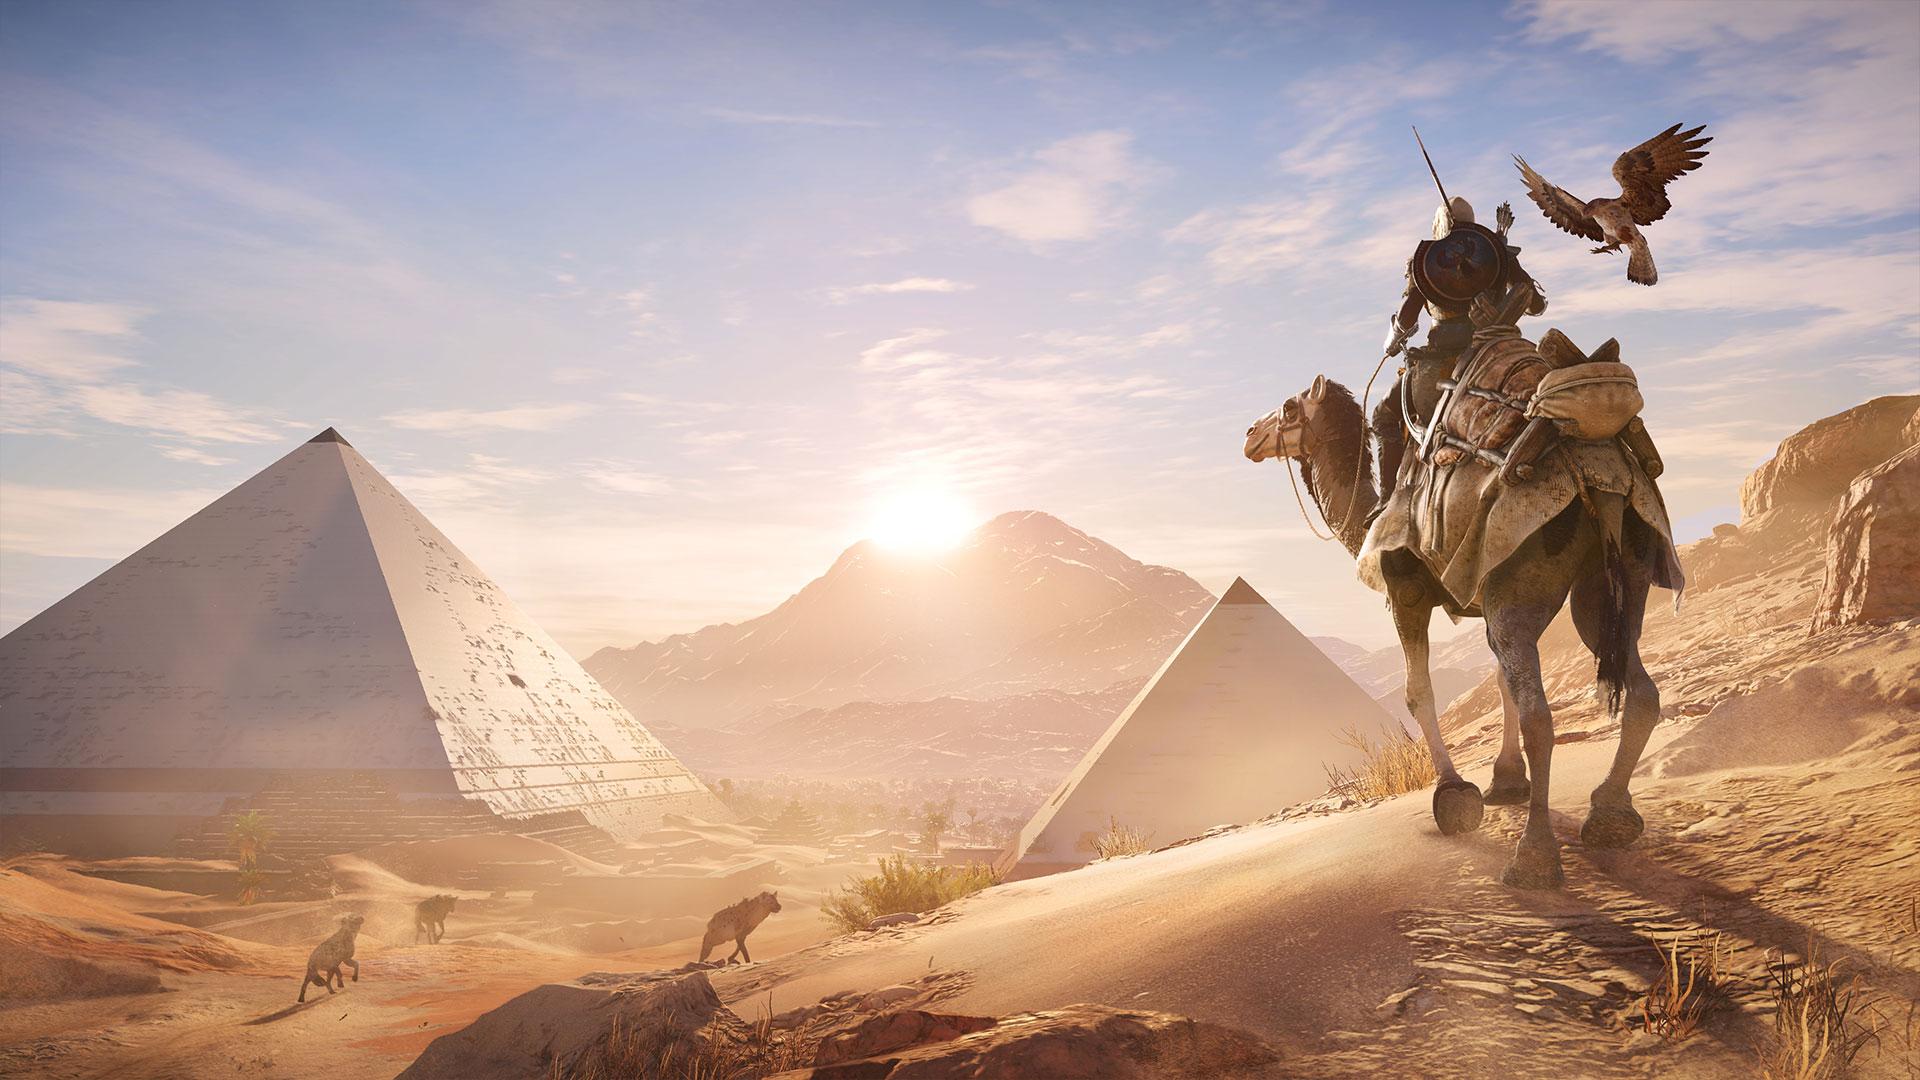 Assassins-Creed-Origins-4k-gameplay.jpg